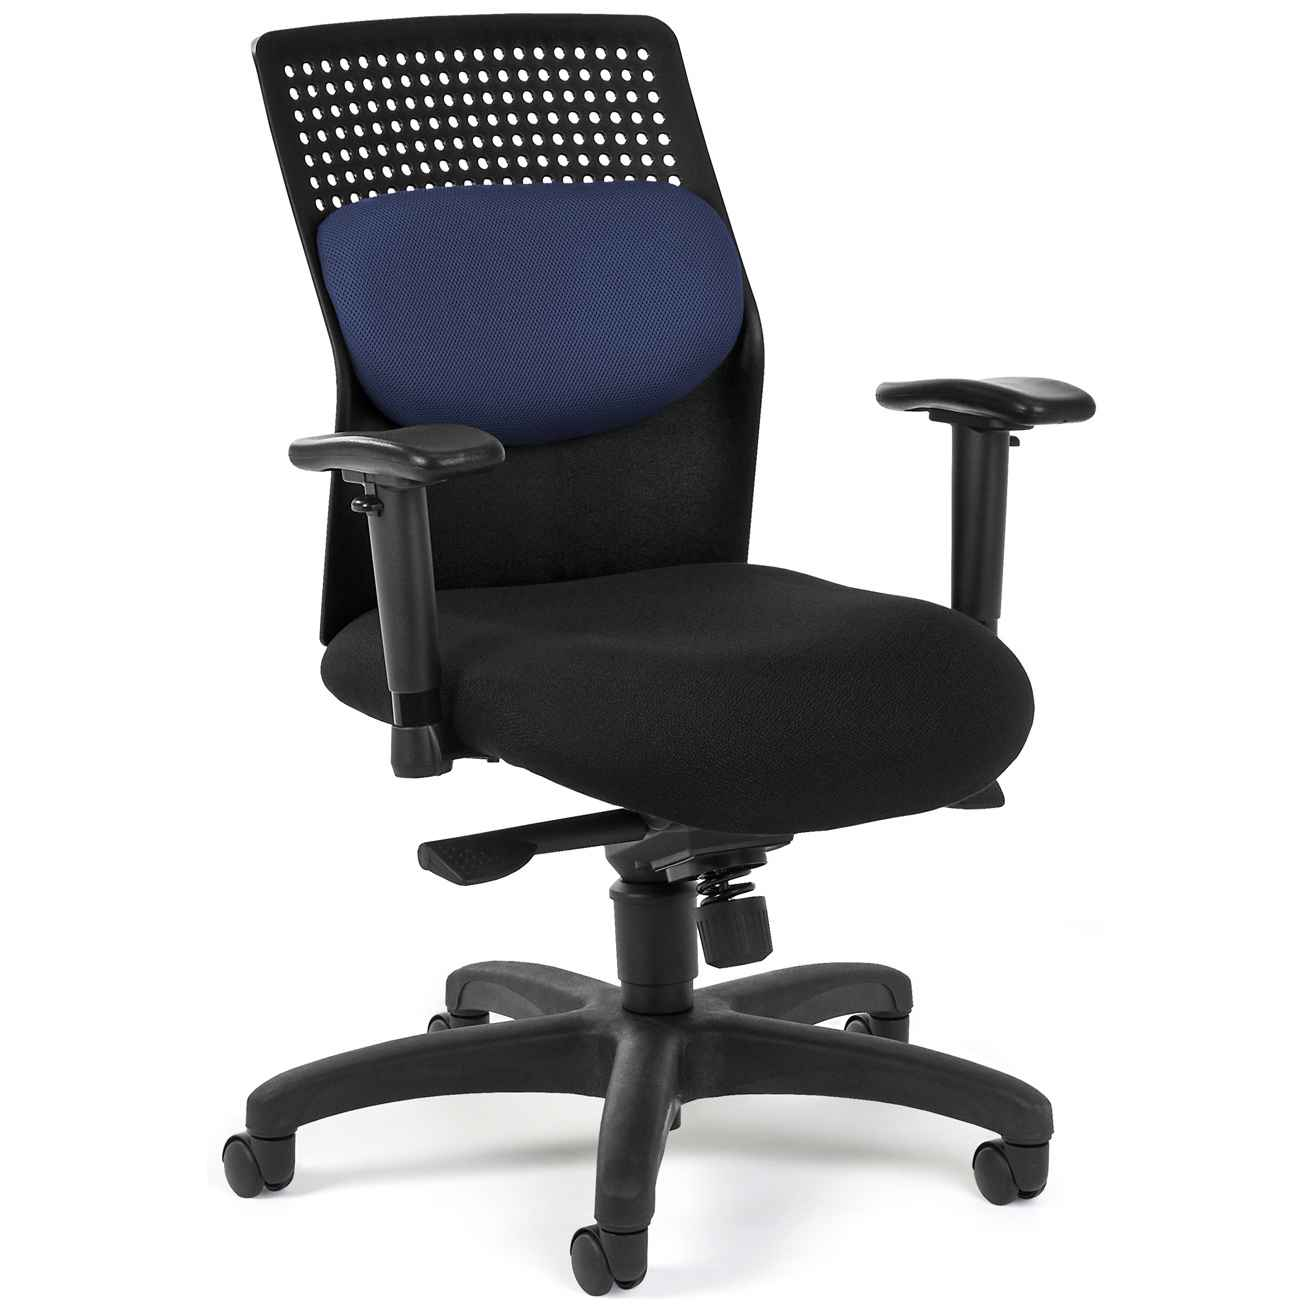 recaro computer chair  Office Furniture